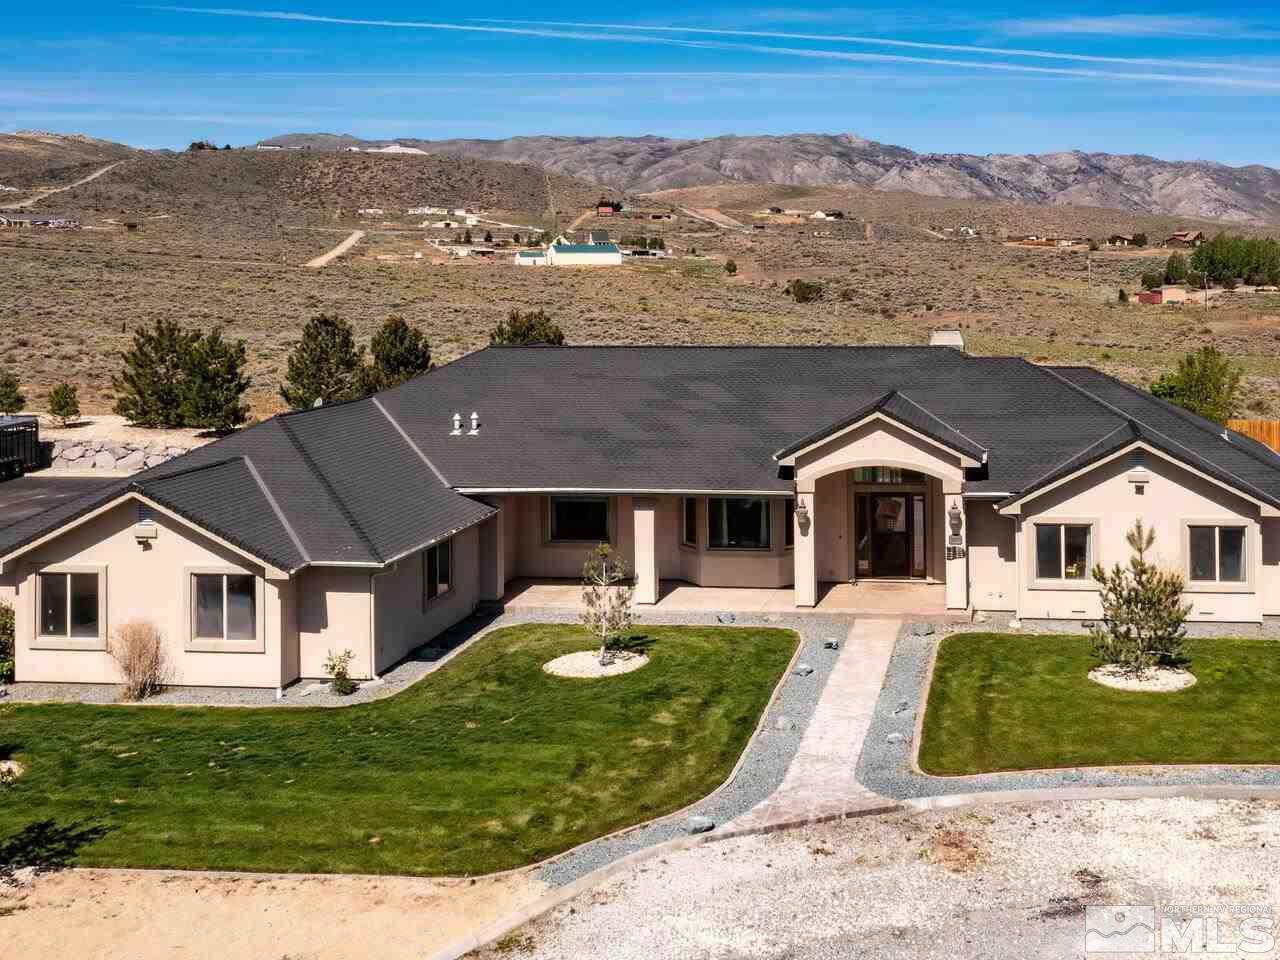 Image for 345 Desert Sun Lane, Reno, NV 89508-6616